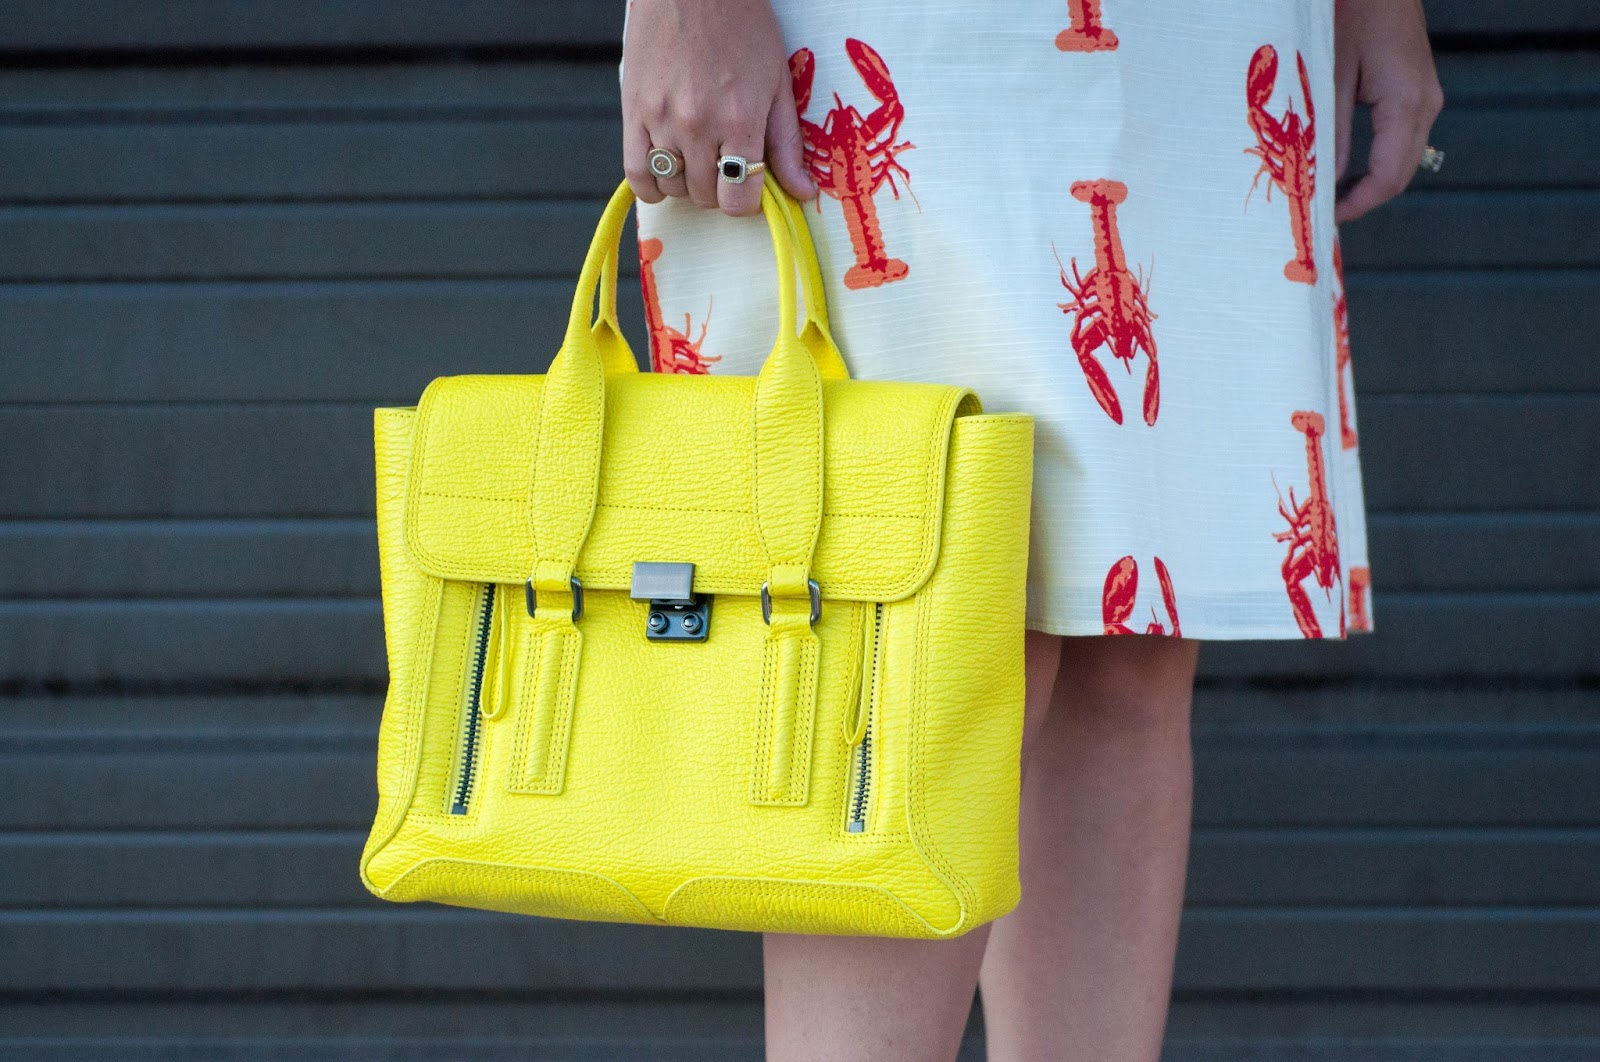 ootd, 3.1 phillip lim pashli satchel, 3.1 phillip lim handbag, yellow purse, lobster dress, ootd